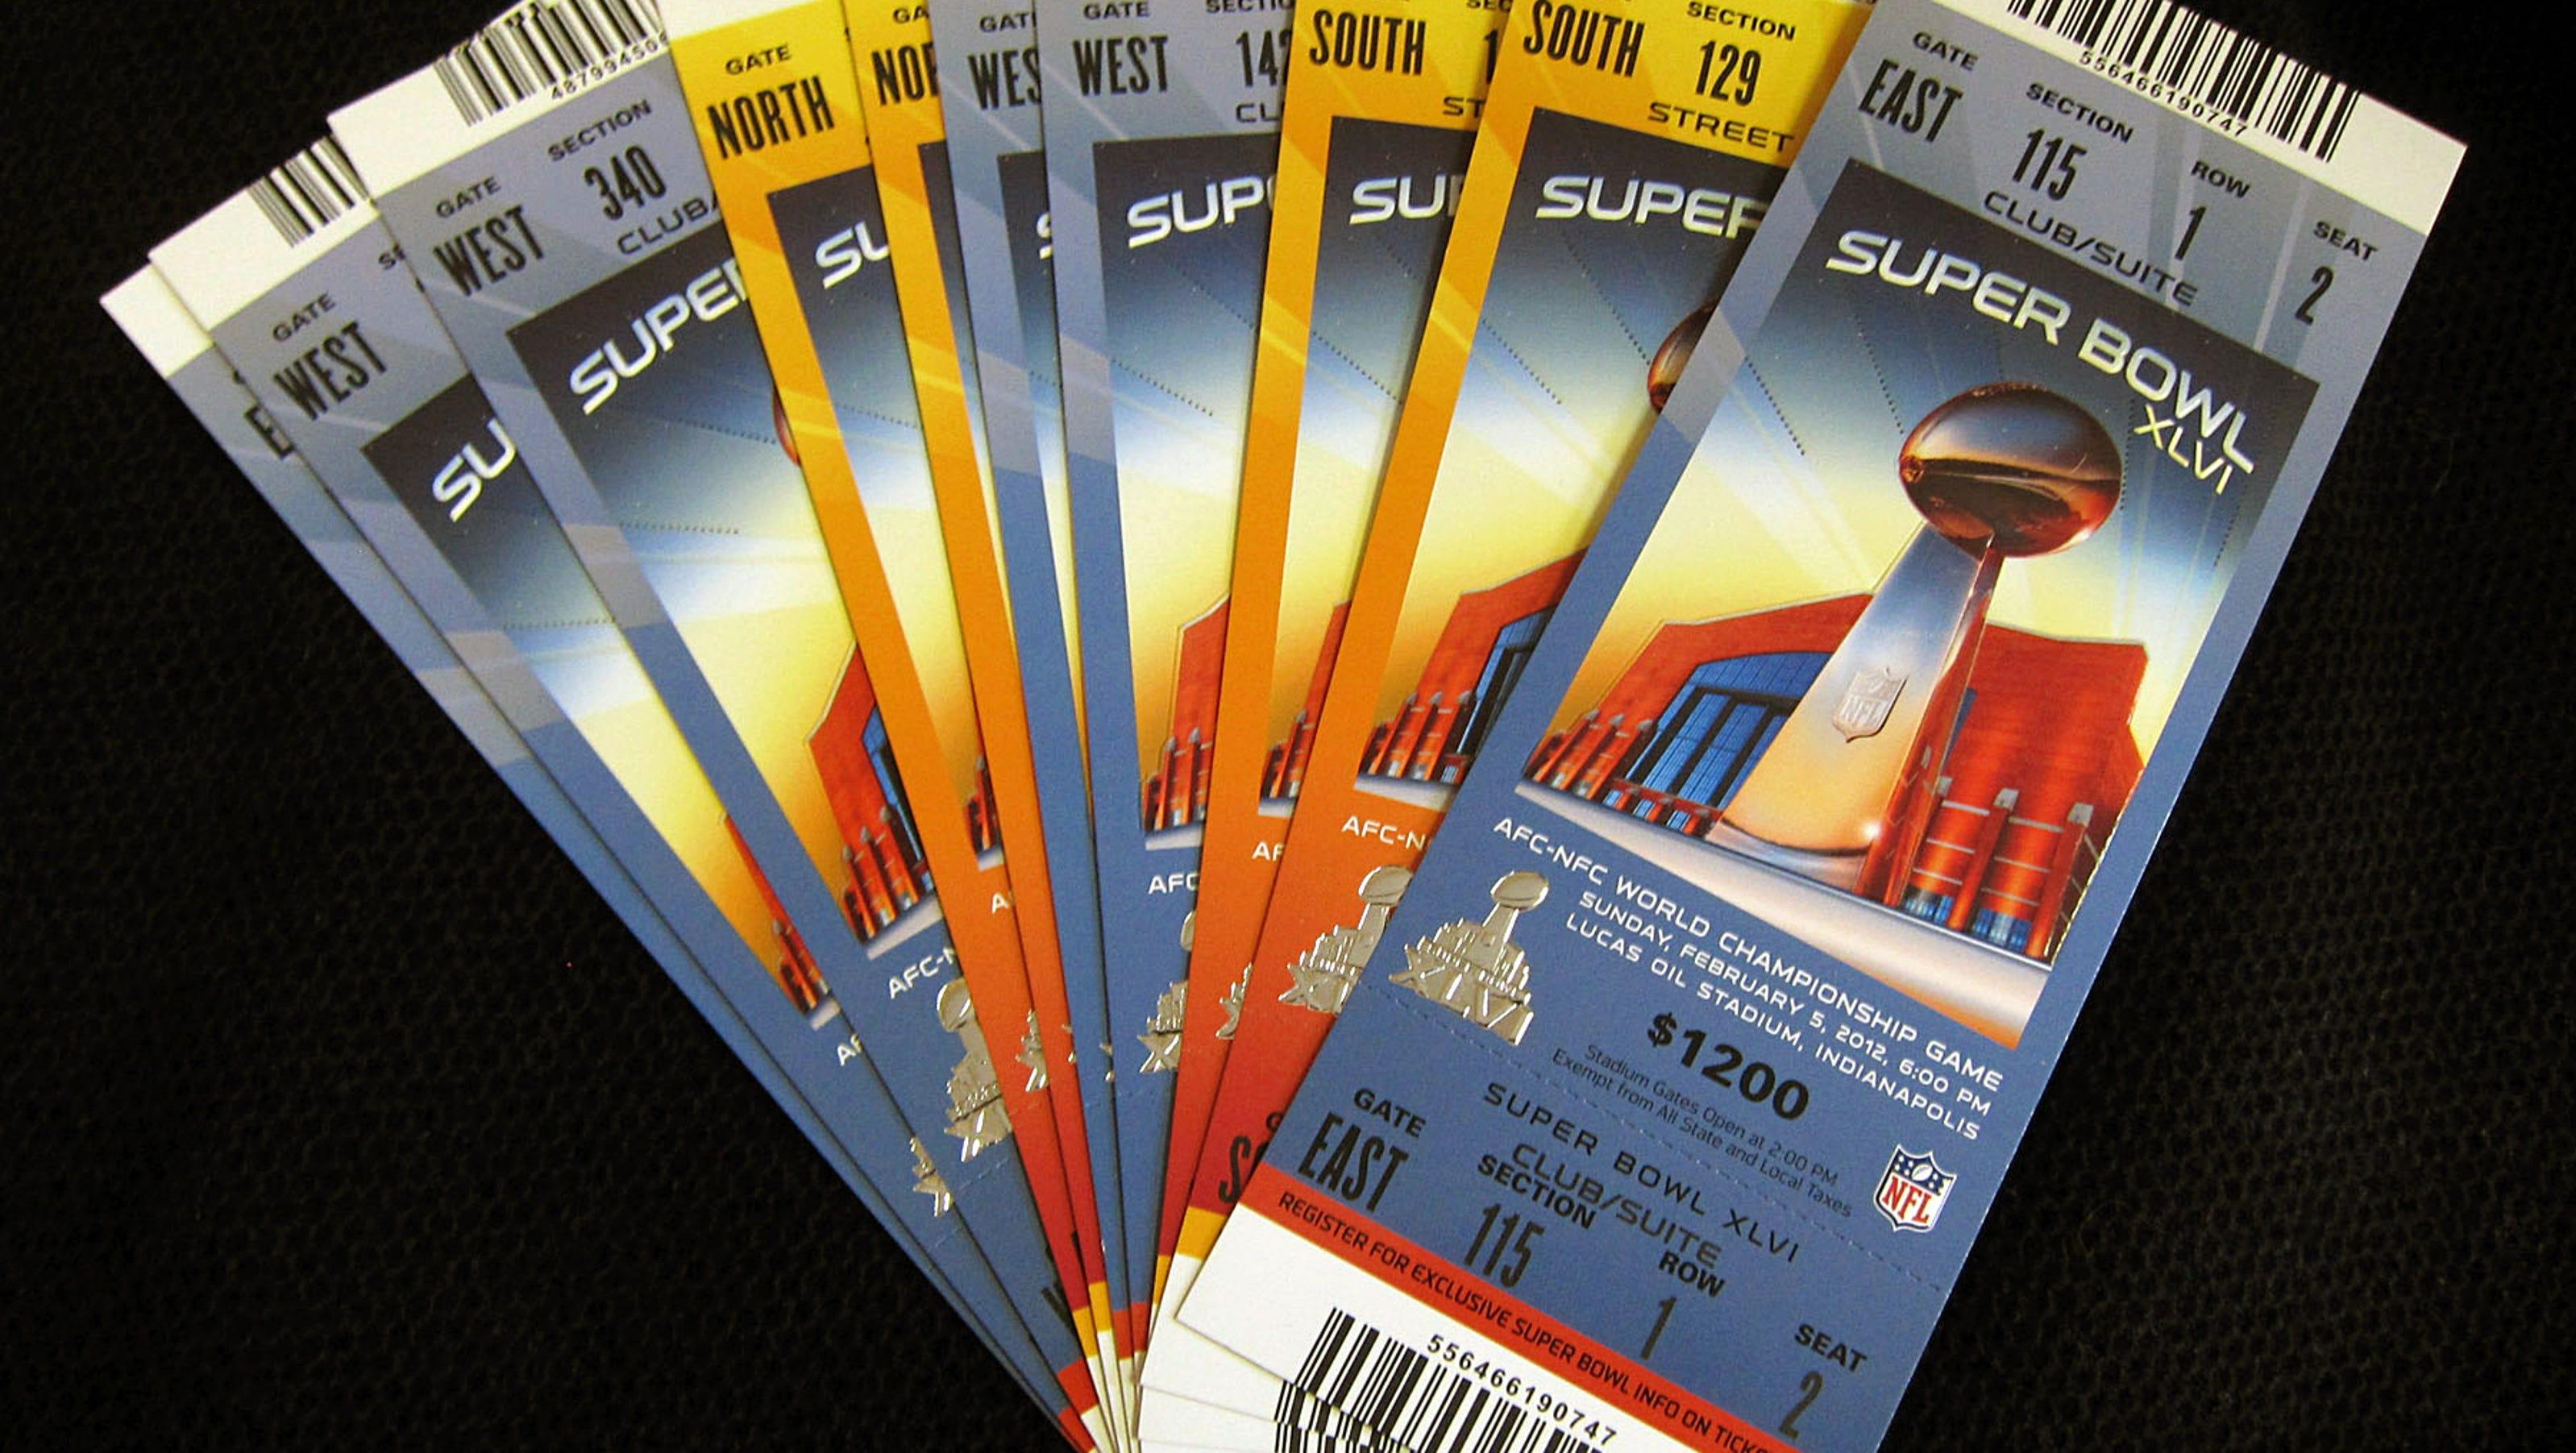 super bowl 2013 tickets